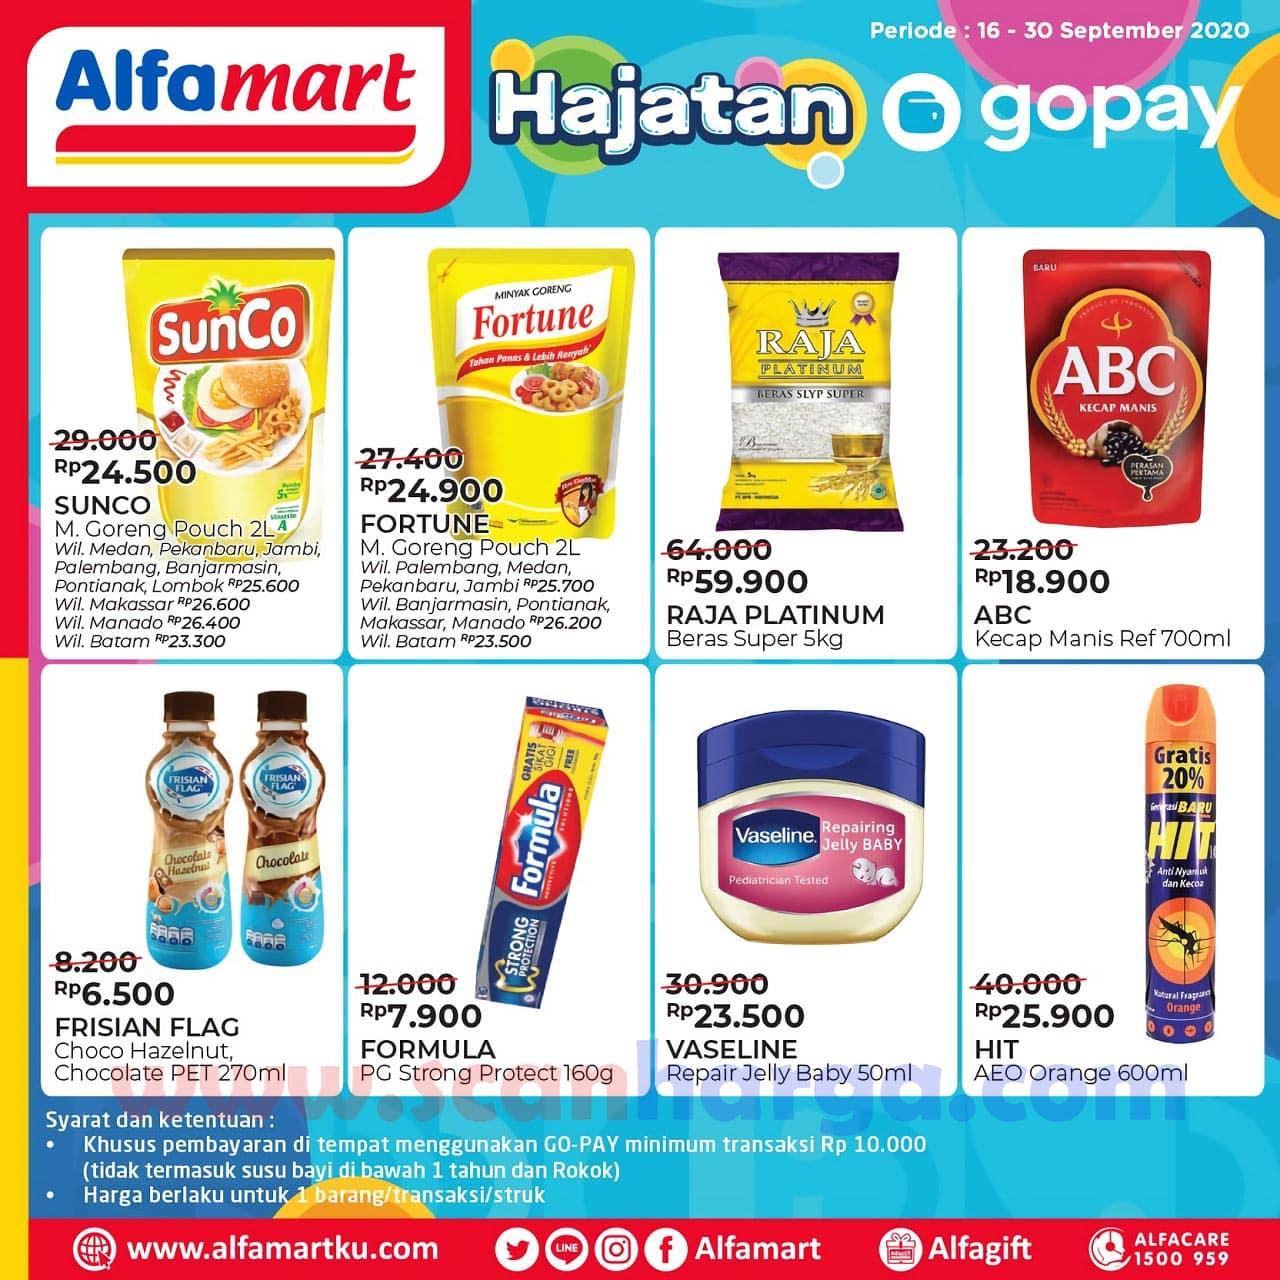 Promo Alfamart GoPay Hajatan 16 - 30 September 2020